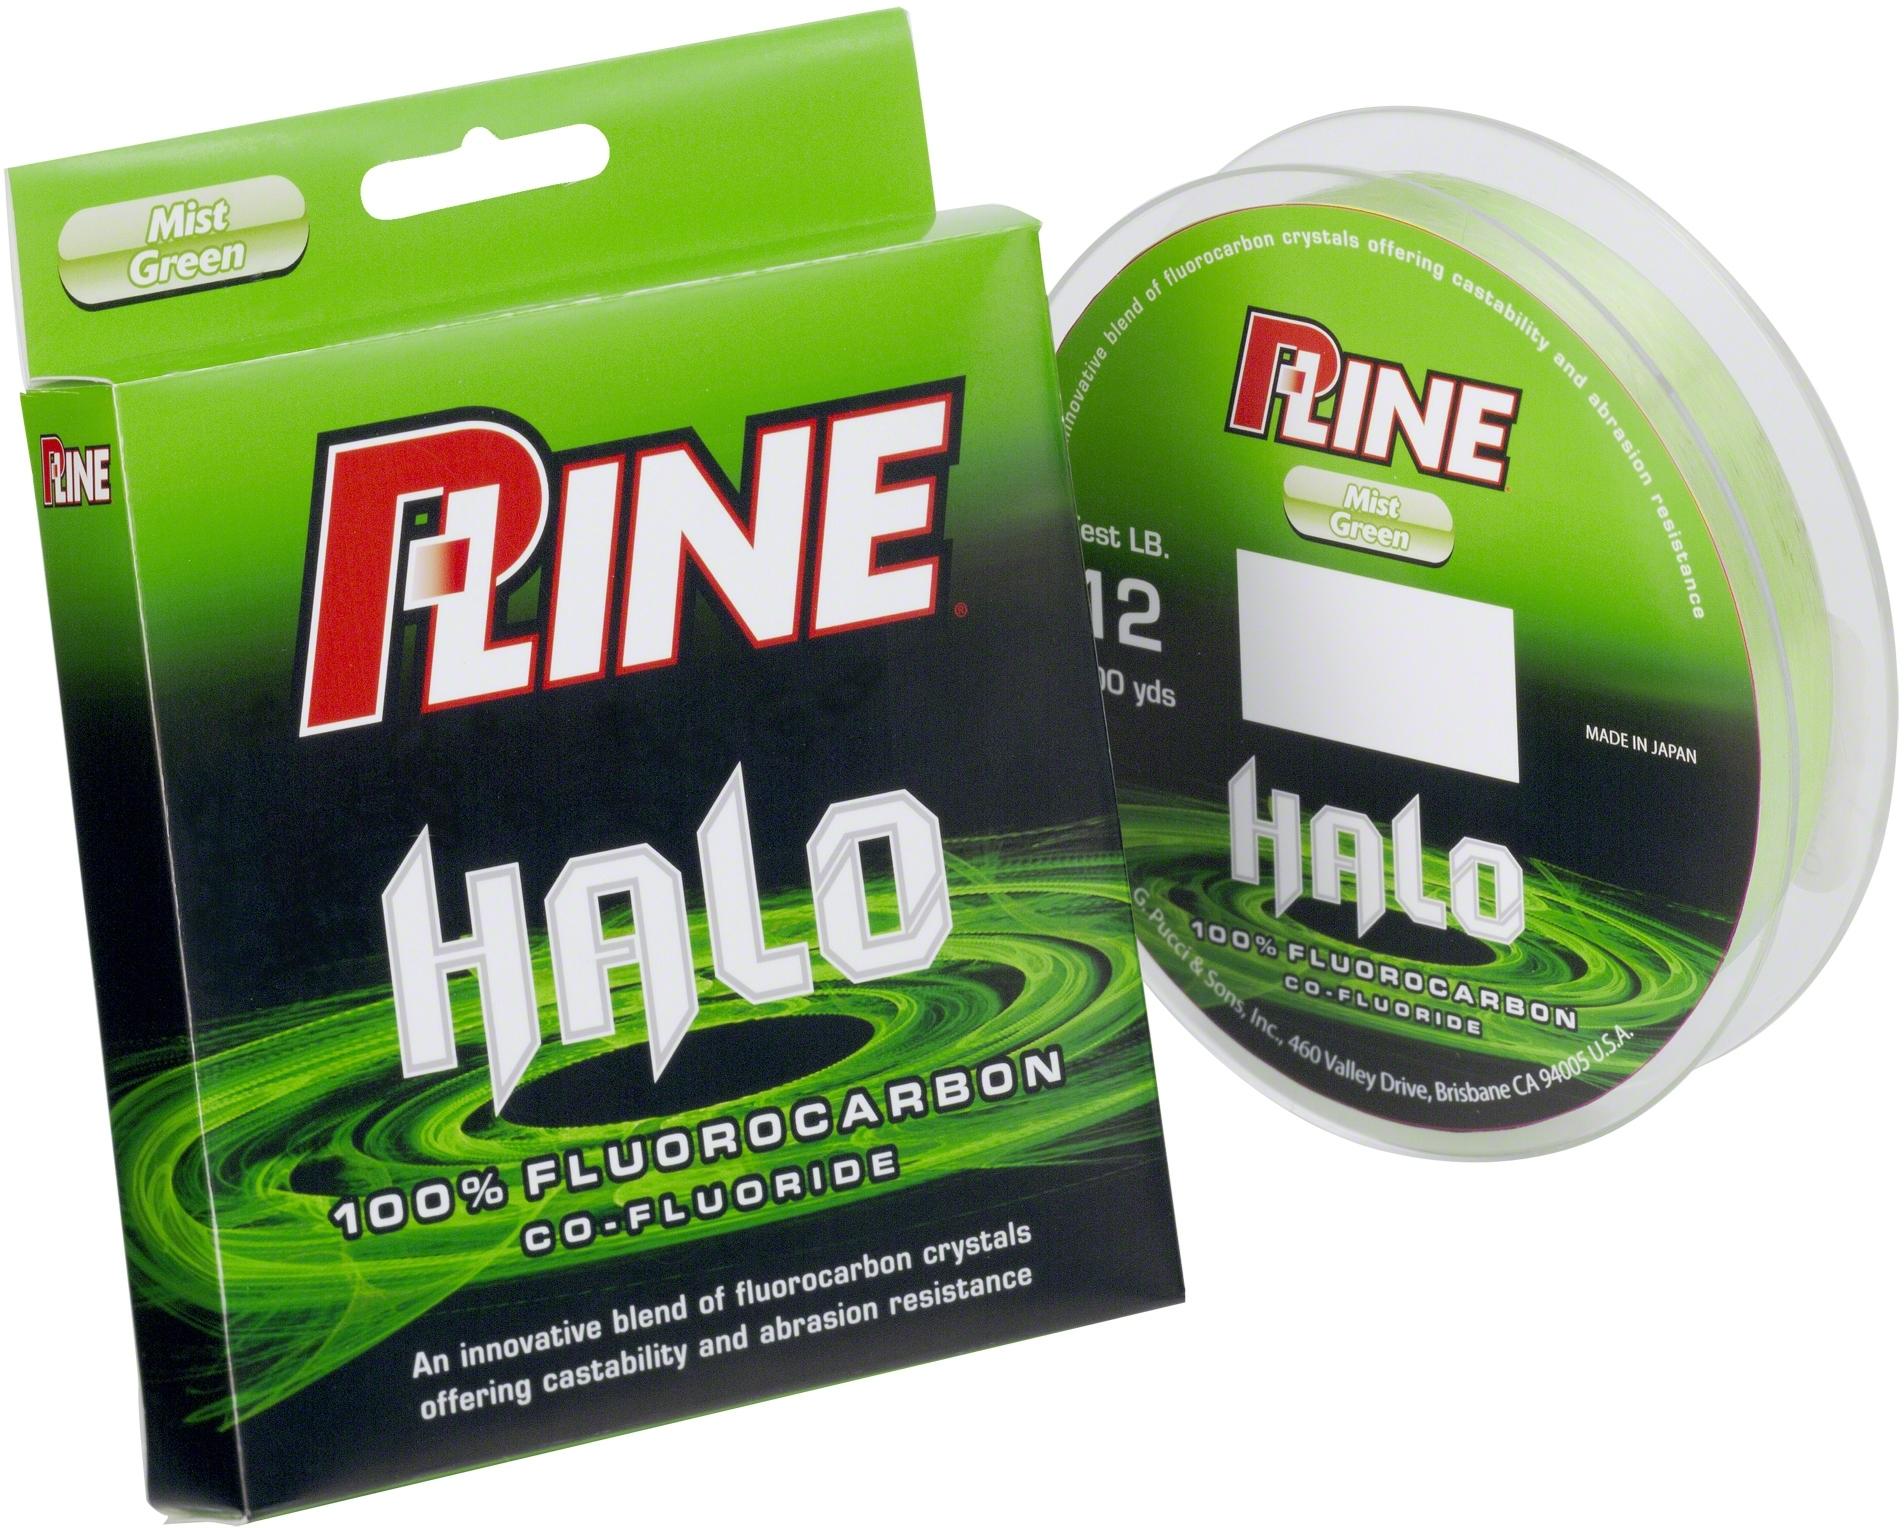 P-Line HF200-15 Halo Fluorocarbon 15Lb 200Yds Mist Green Fishing Line